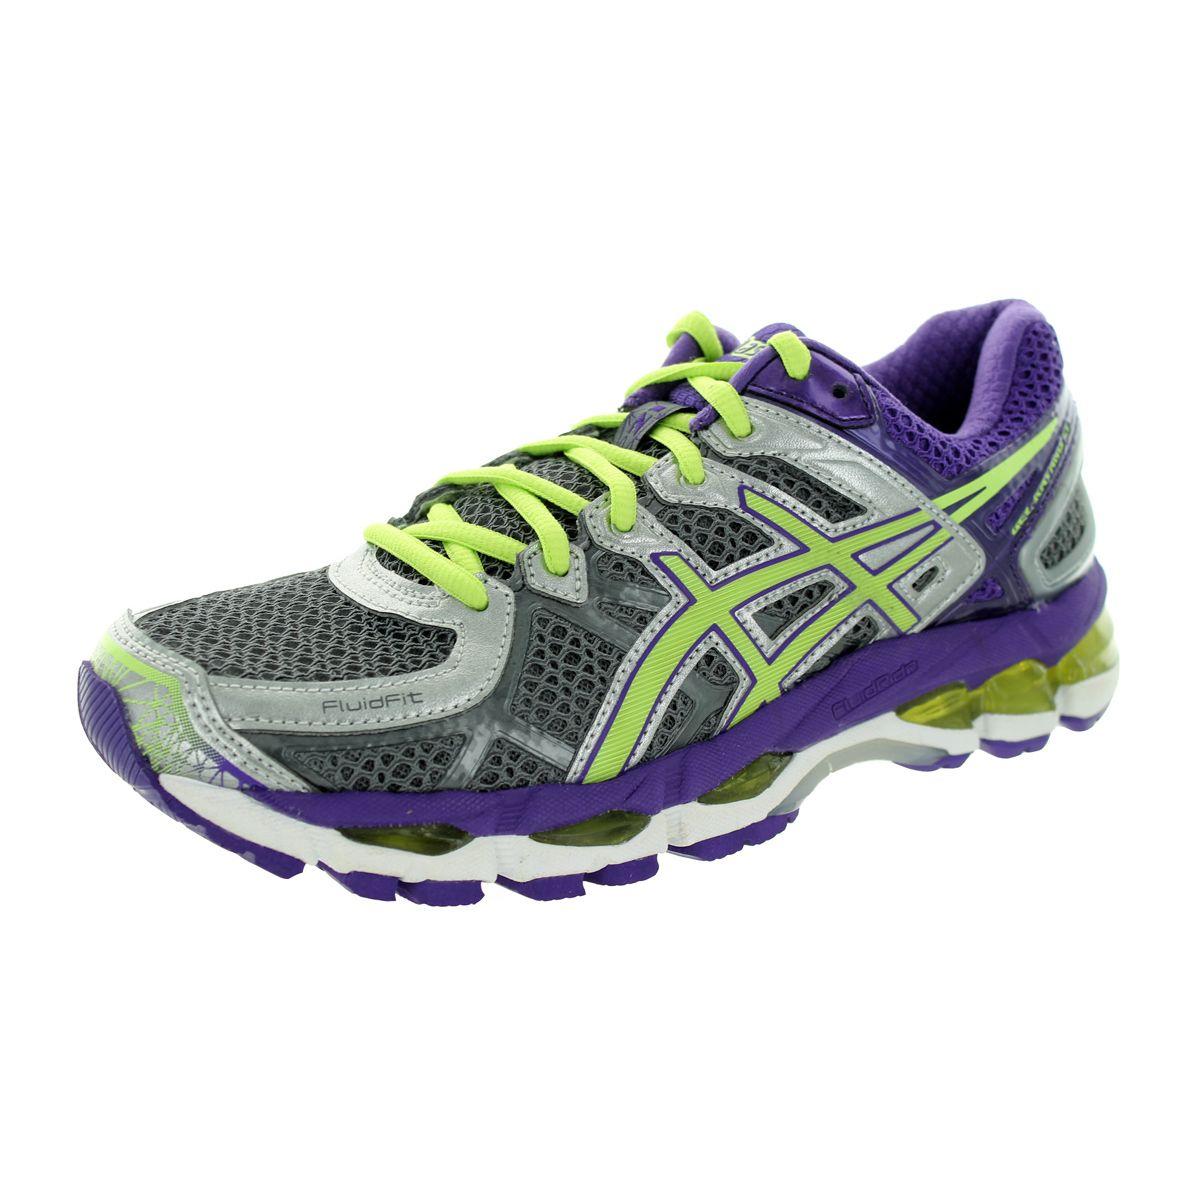 Asics Women's Gel-Kayano 21 Charcoal/Sharp Green/Purple Running Shoe